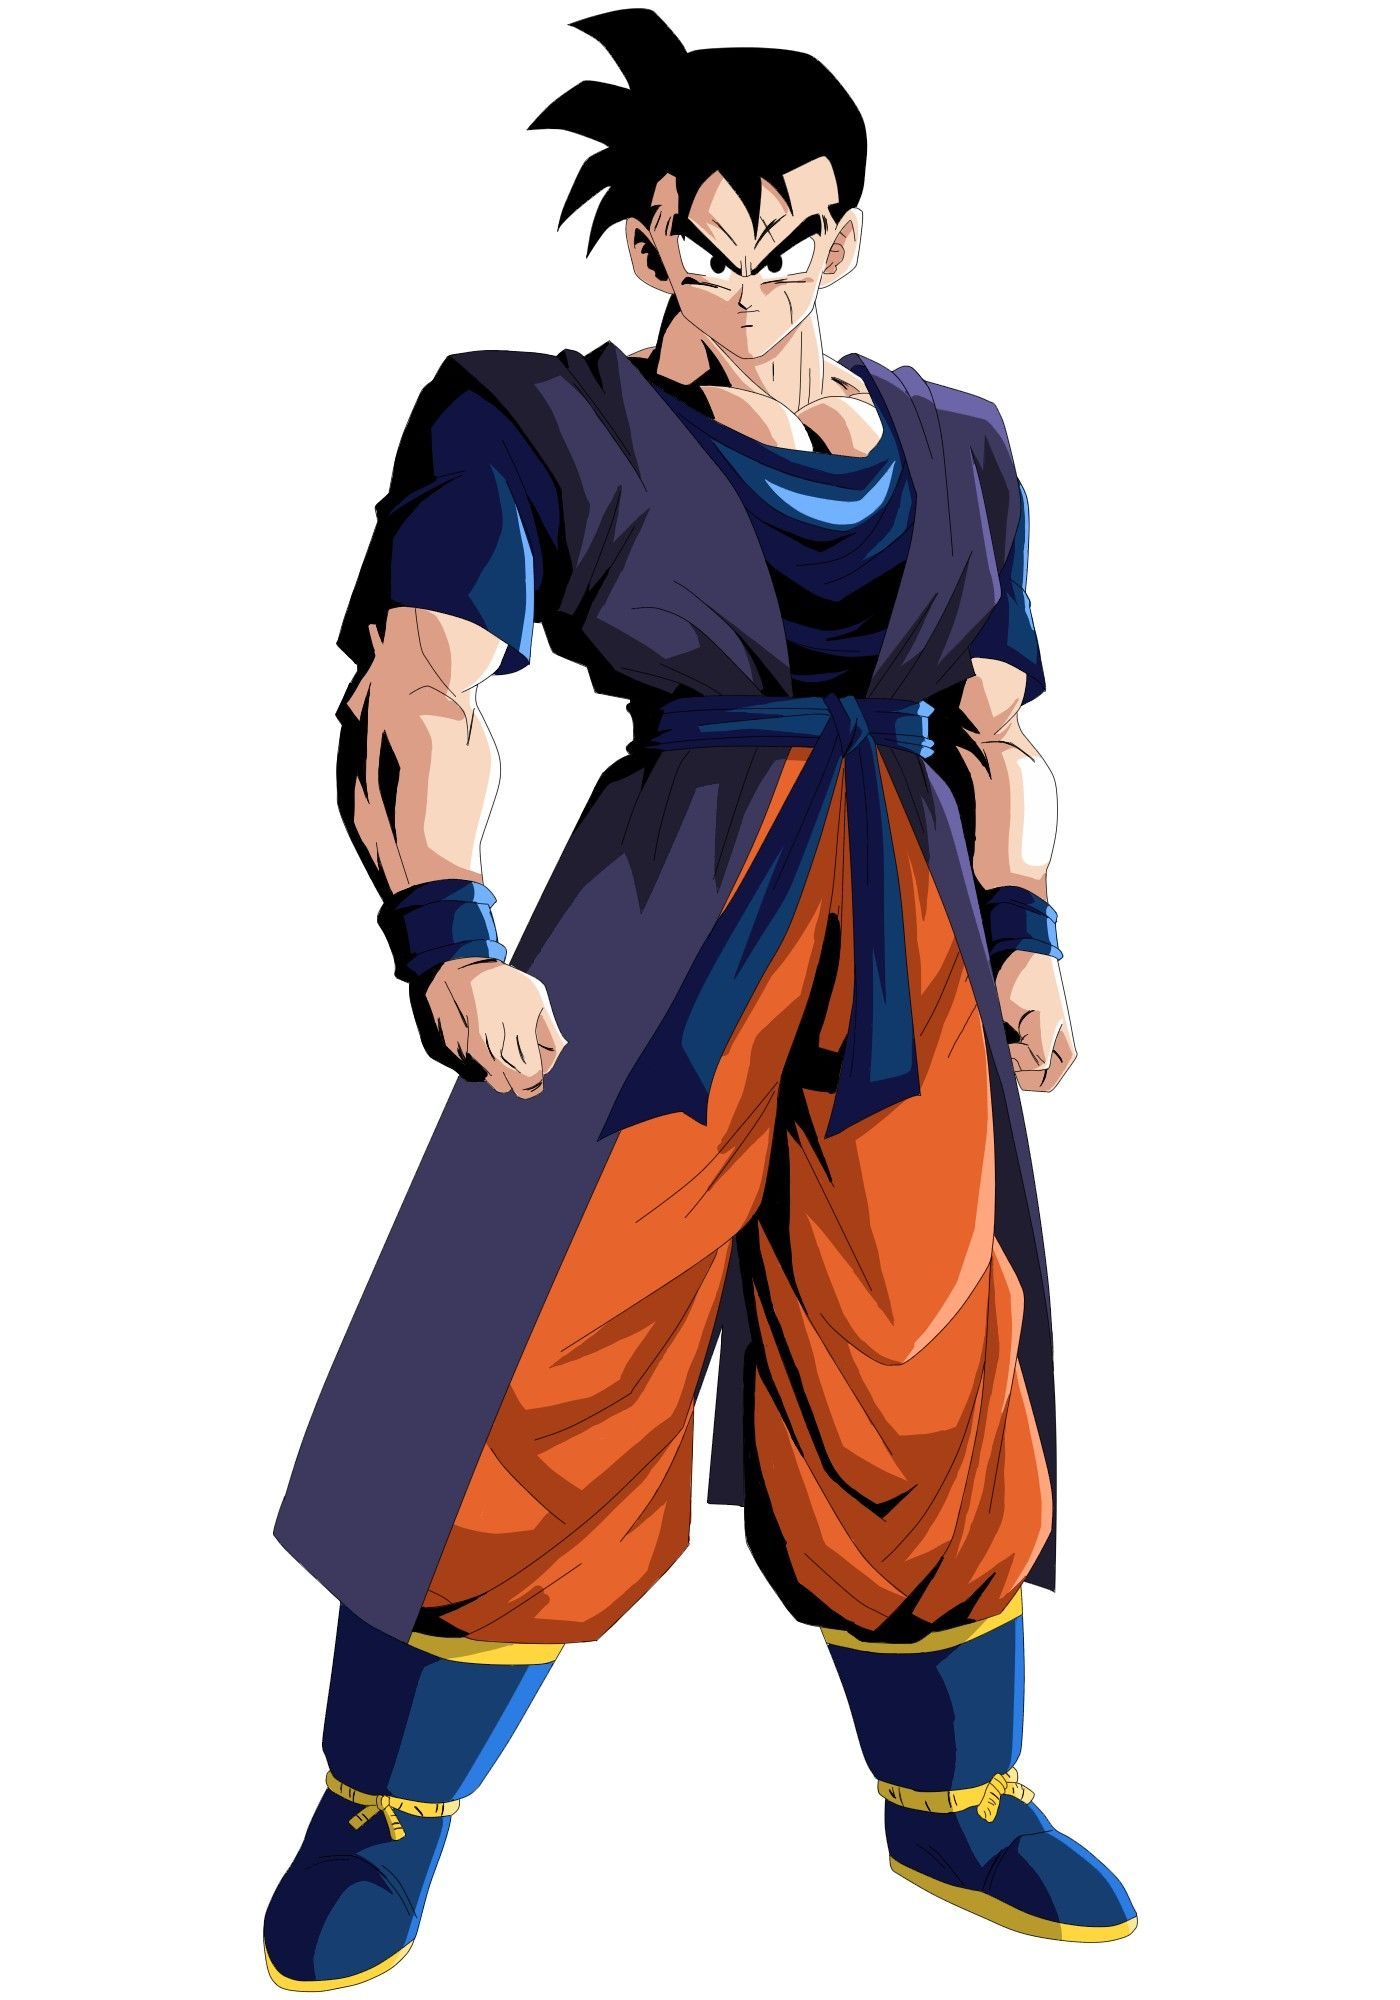 Gohan Del Futuro Nuevo Dogi In 2021 Dragon Ball Super Manga Dragon Ball Super Dragon Ball